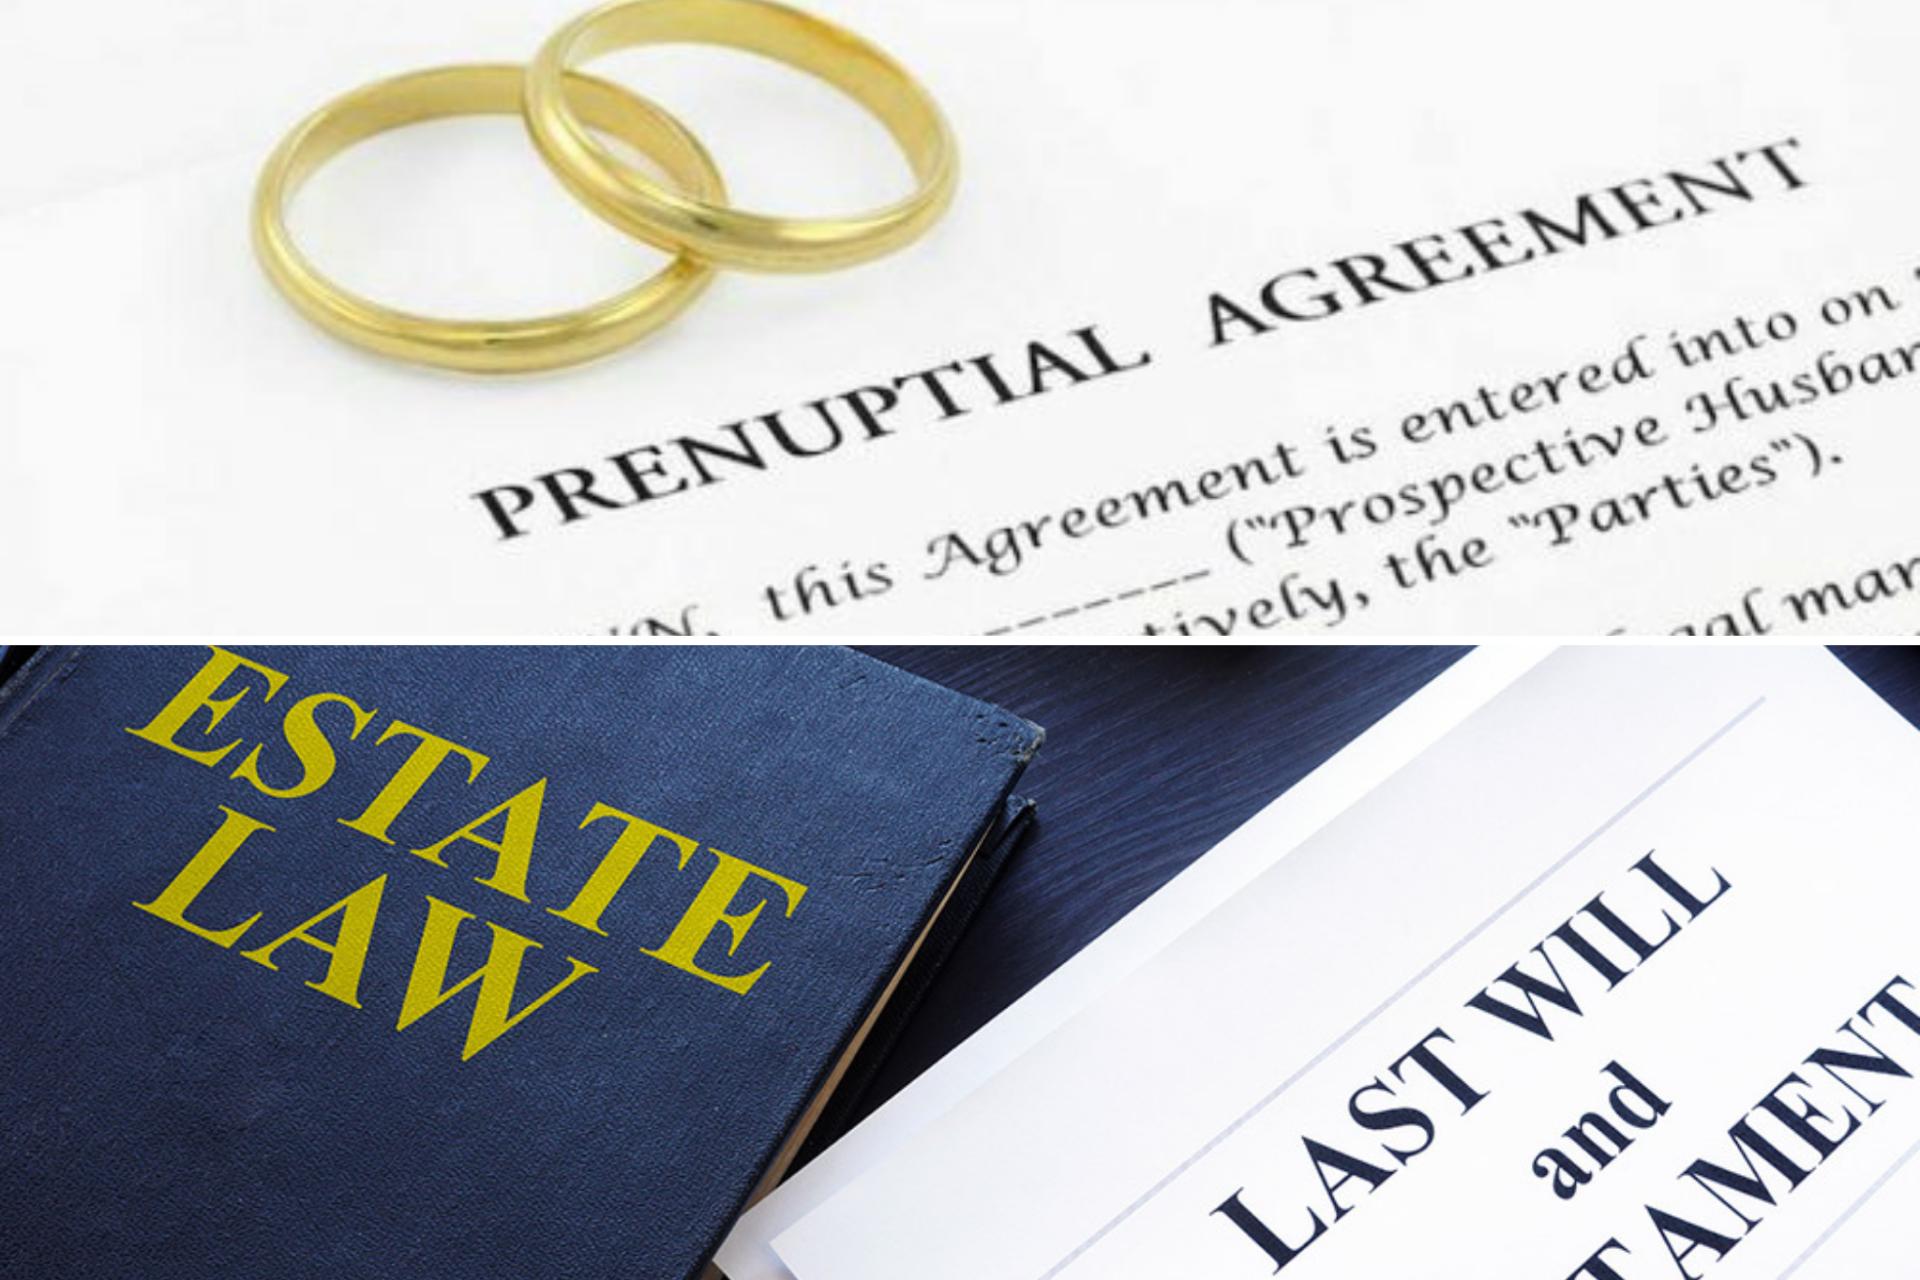 LAS Law - prenup agreement